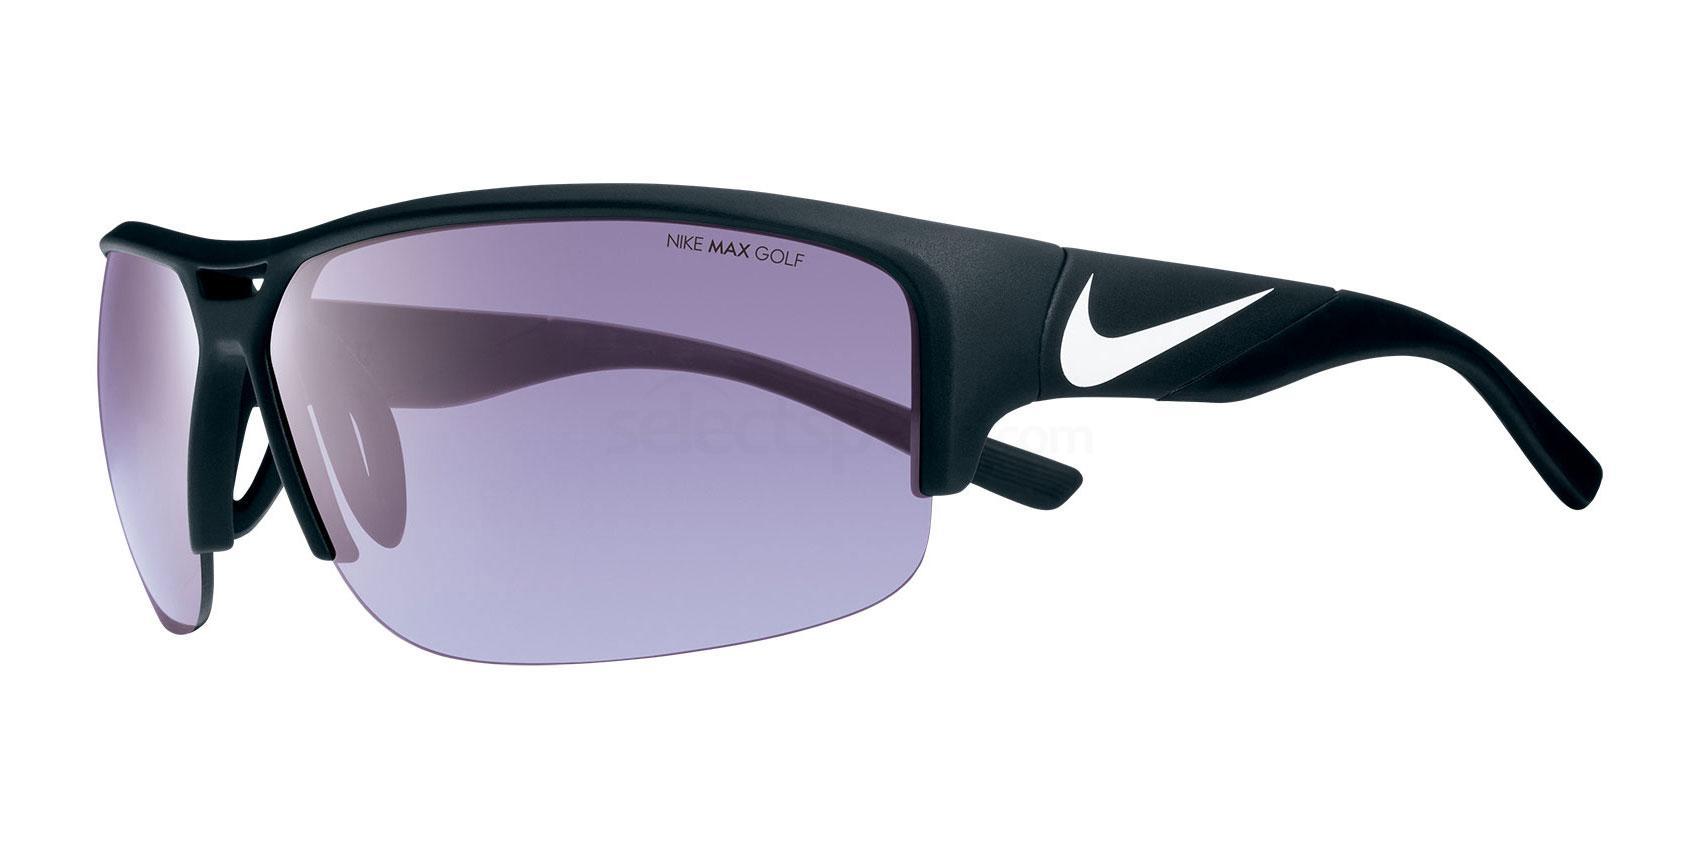 010 NIKE GOLF X2 E EV0871 Sunglasses, Nike